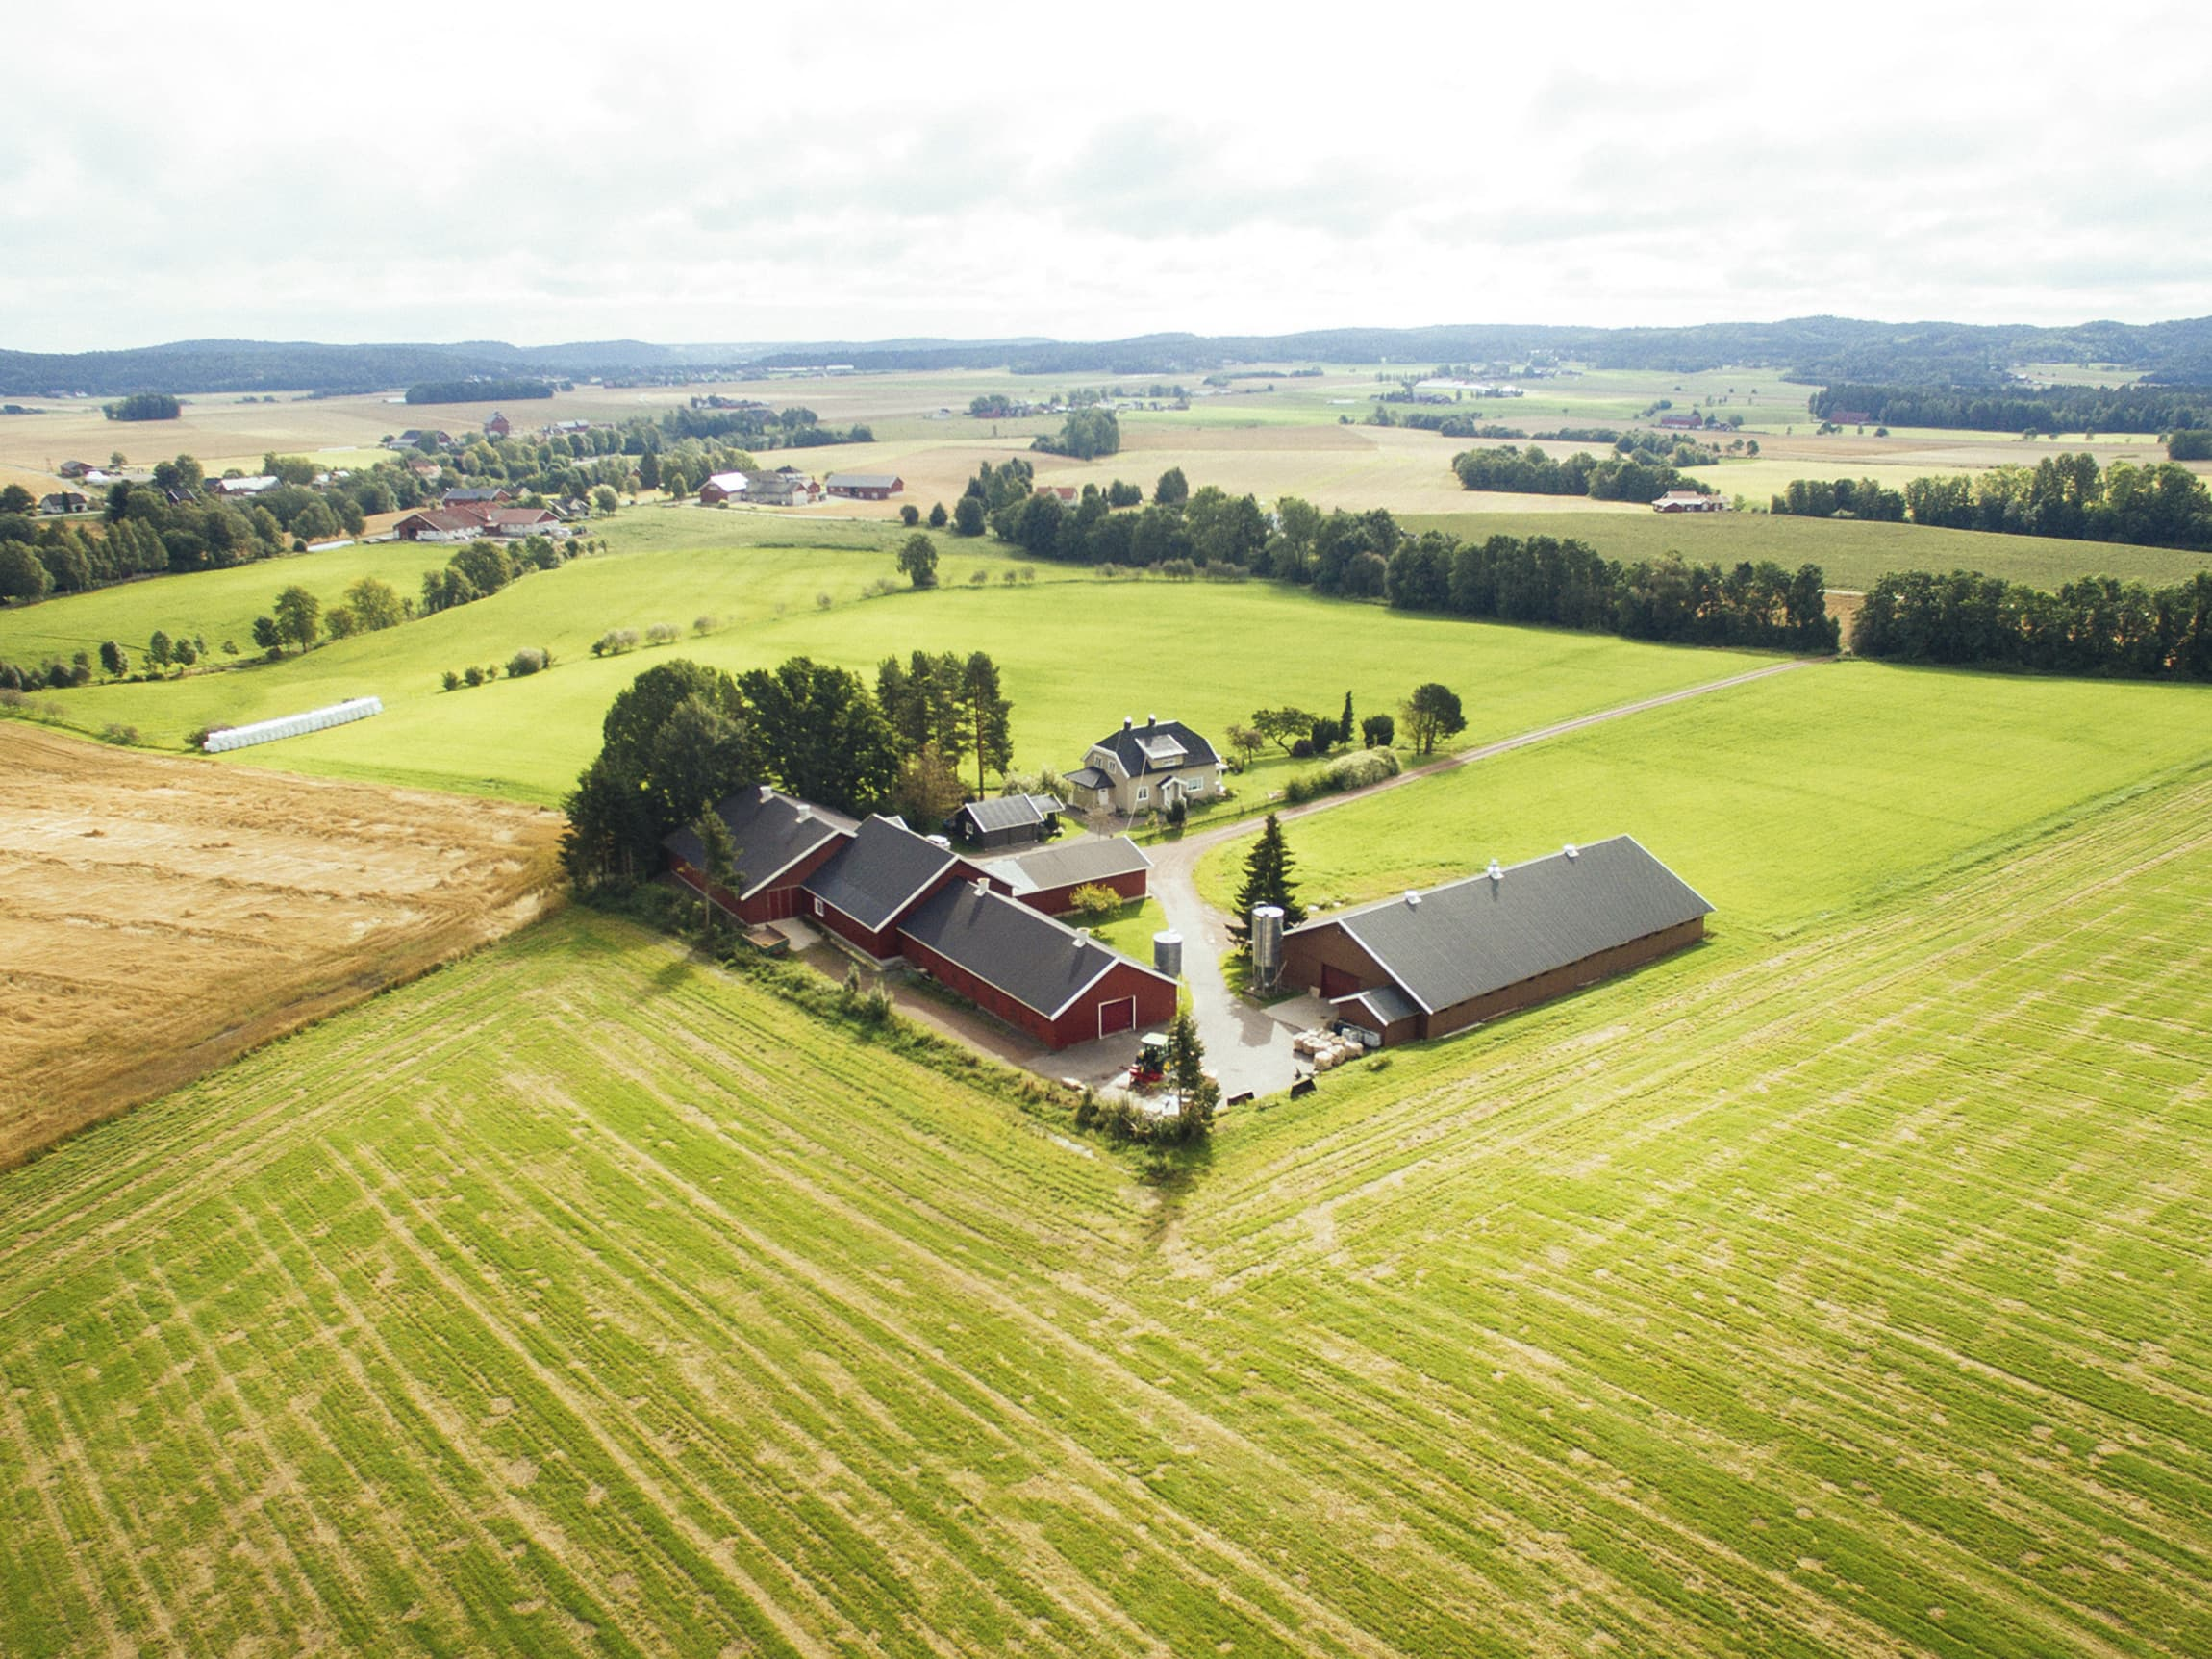 Lerstang Gård samarbeider med flere bønder i nærområdet, blant annet Sigbjørn Rød.